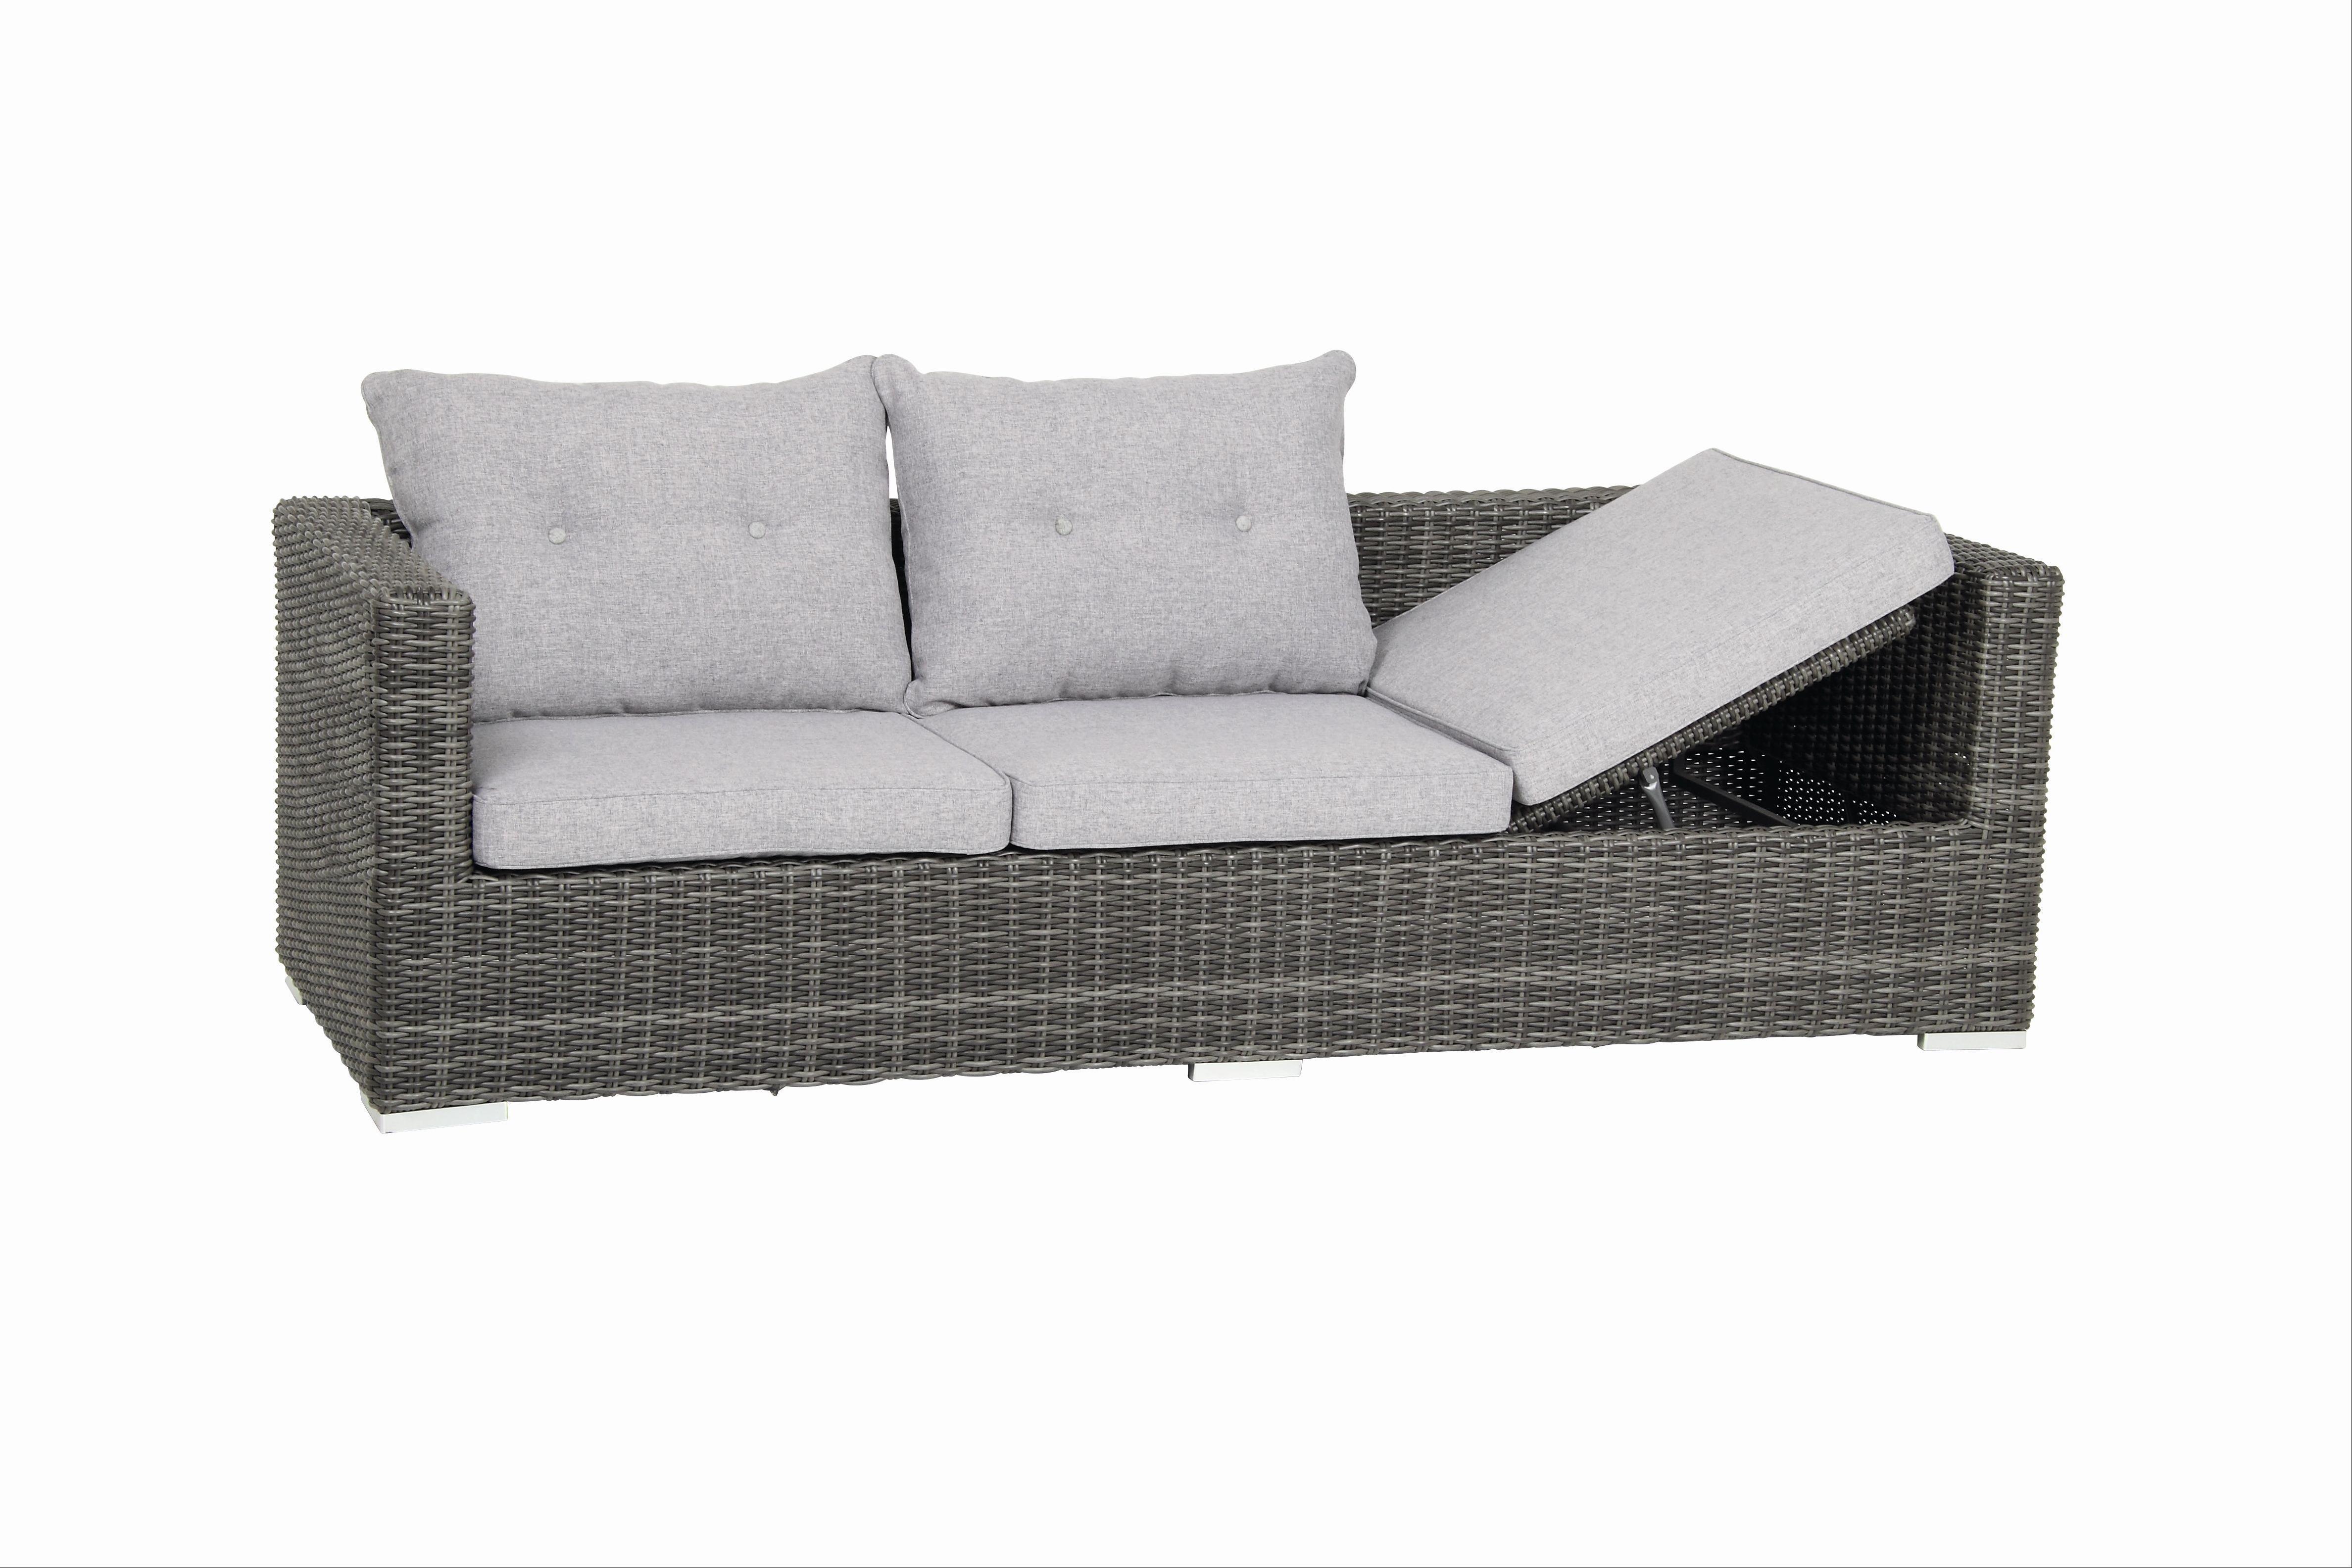 gartenbank gartensofa 3 sitzer acamp sicilia polyrattan grau bei. Black Bedroom Furniture Sets. Home Design Ideas